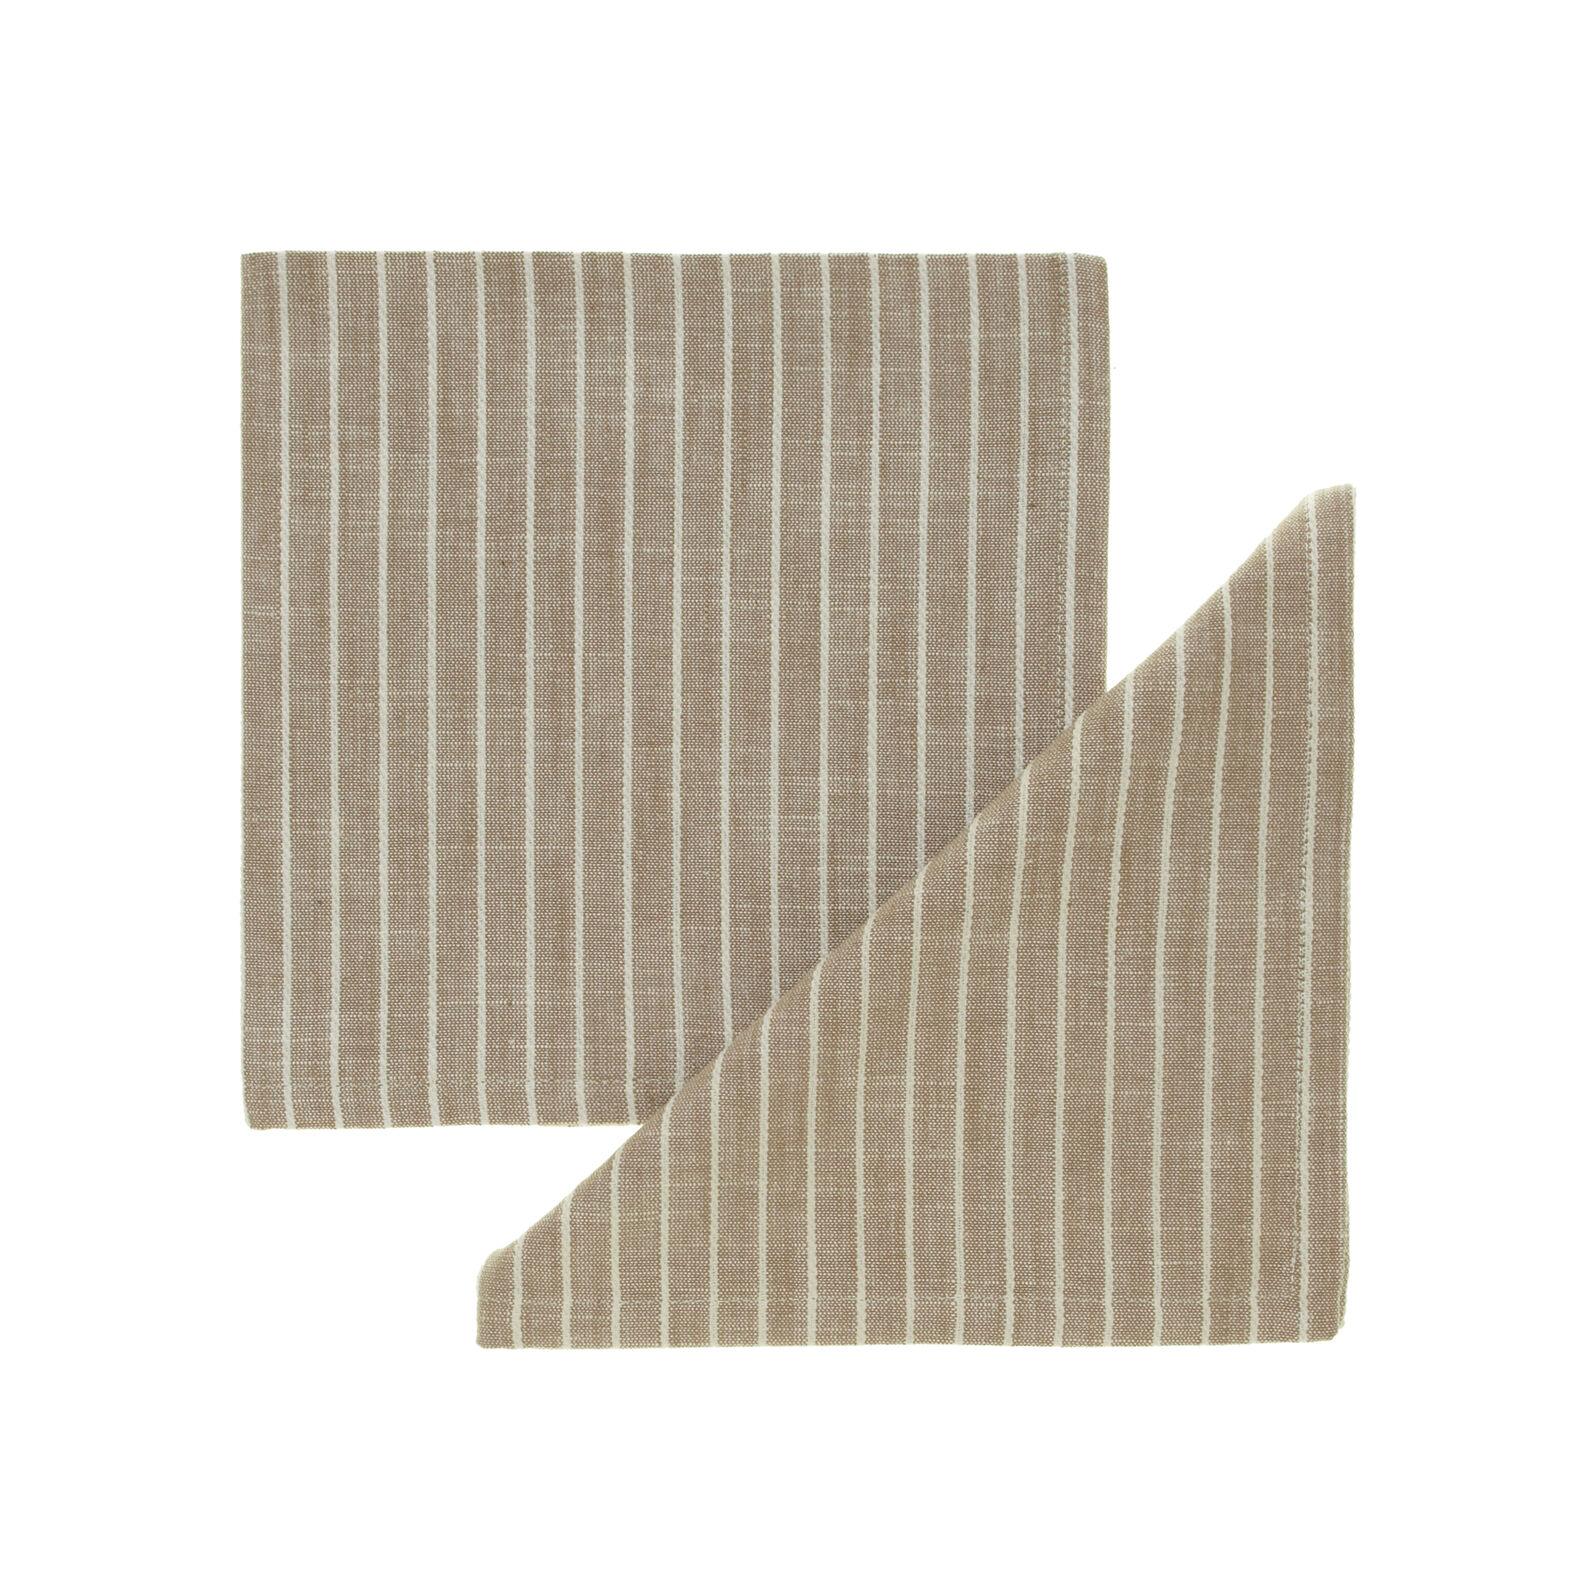 Pair of striped cotton napkins